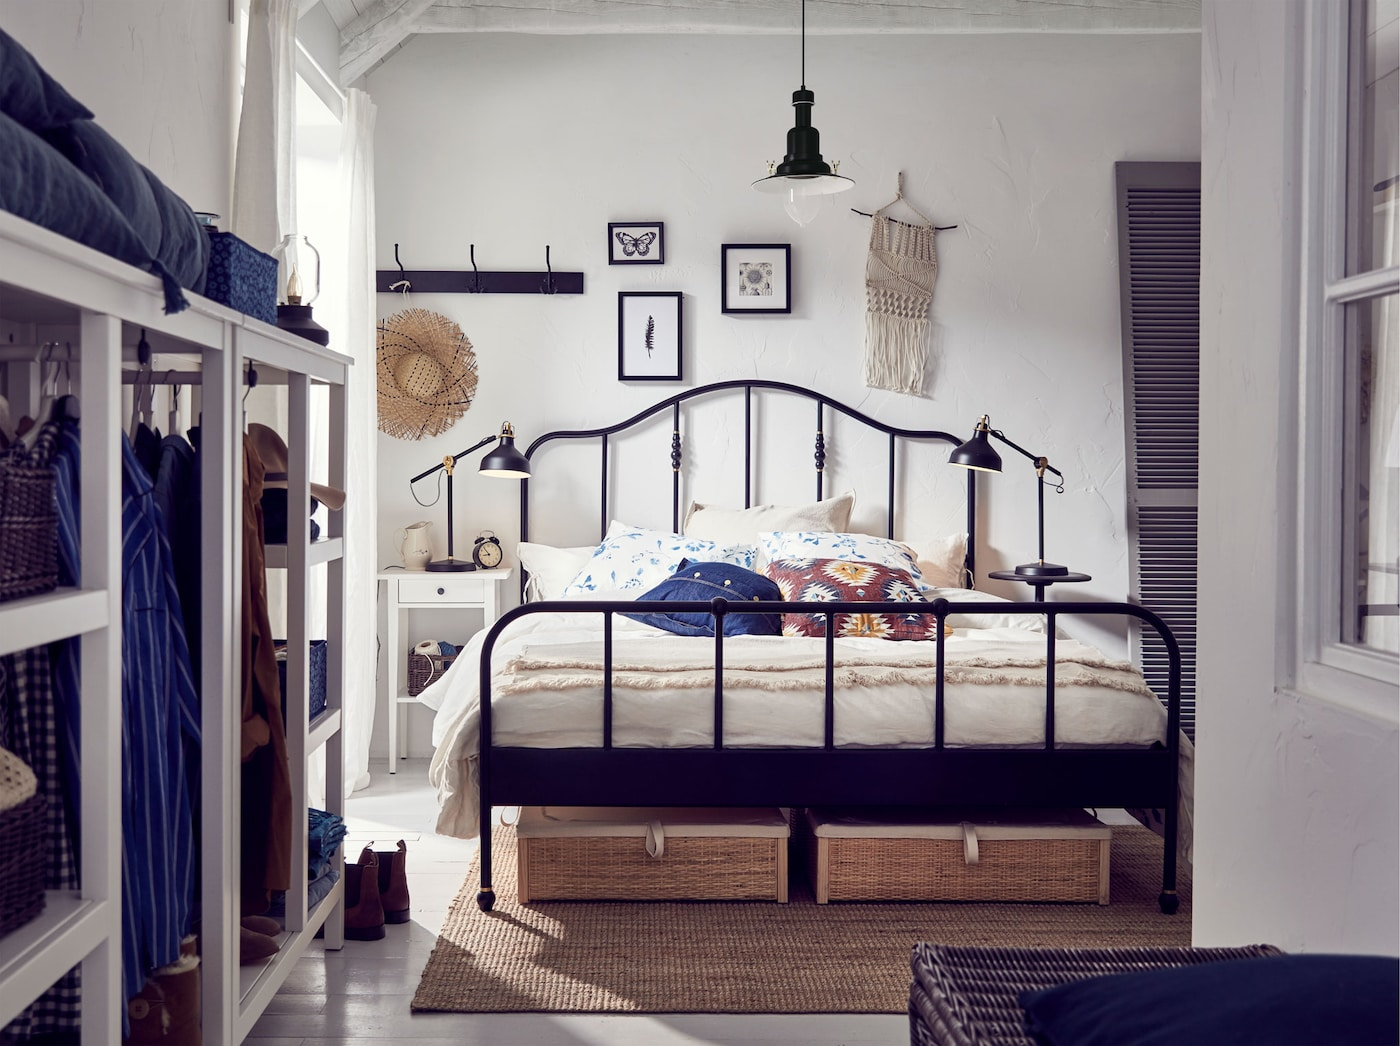 Bedroom furniture inspiration  IKEA Malaysia - IKEA